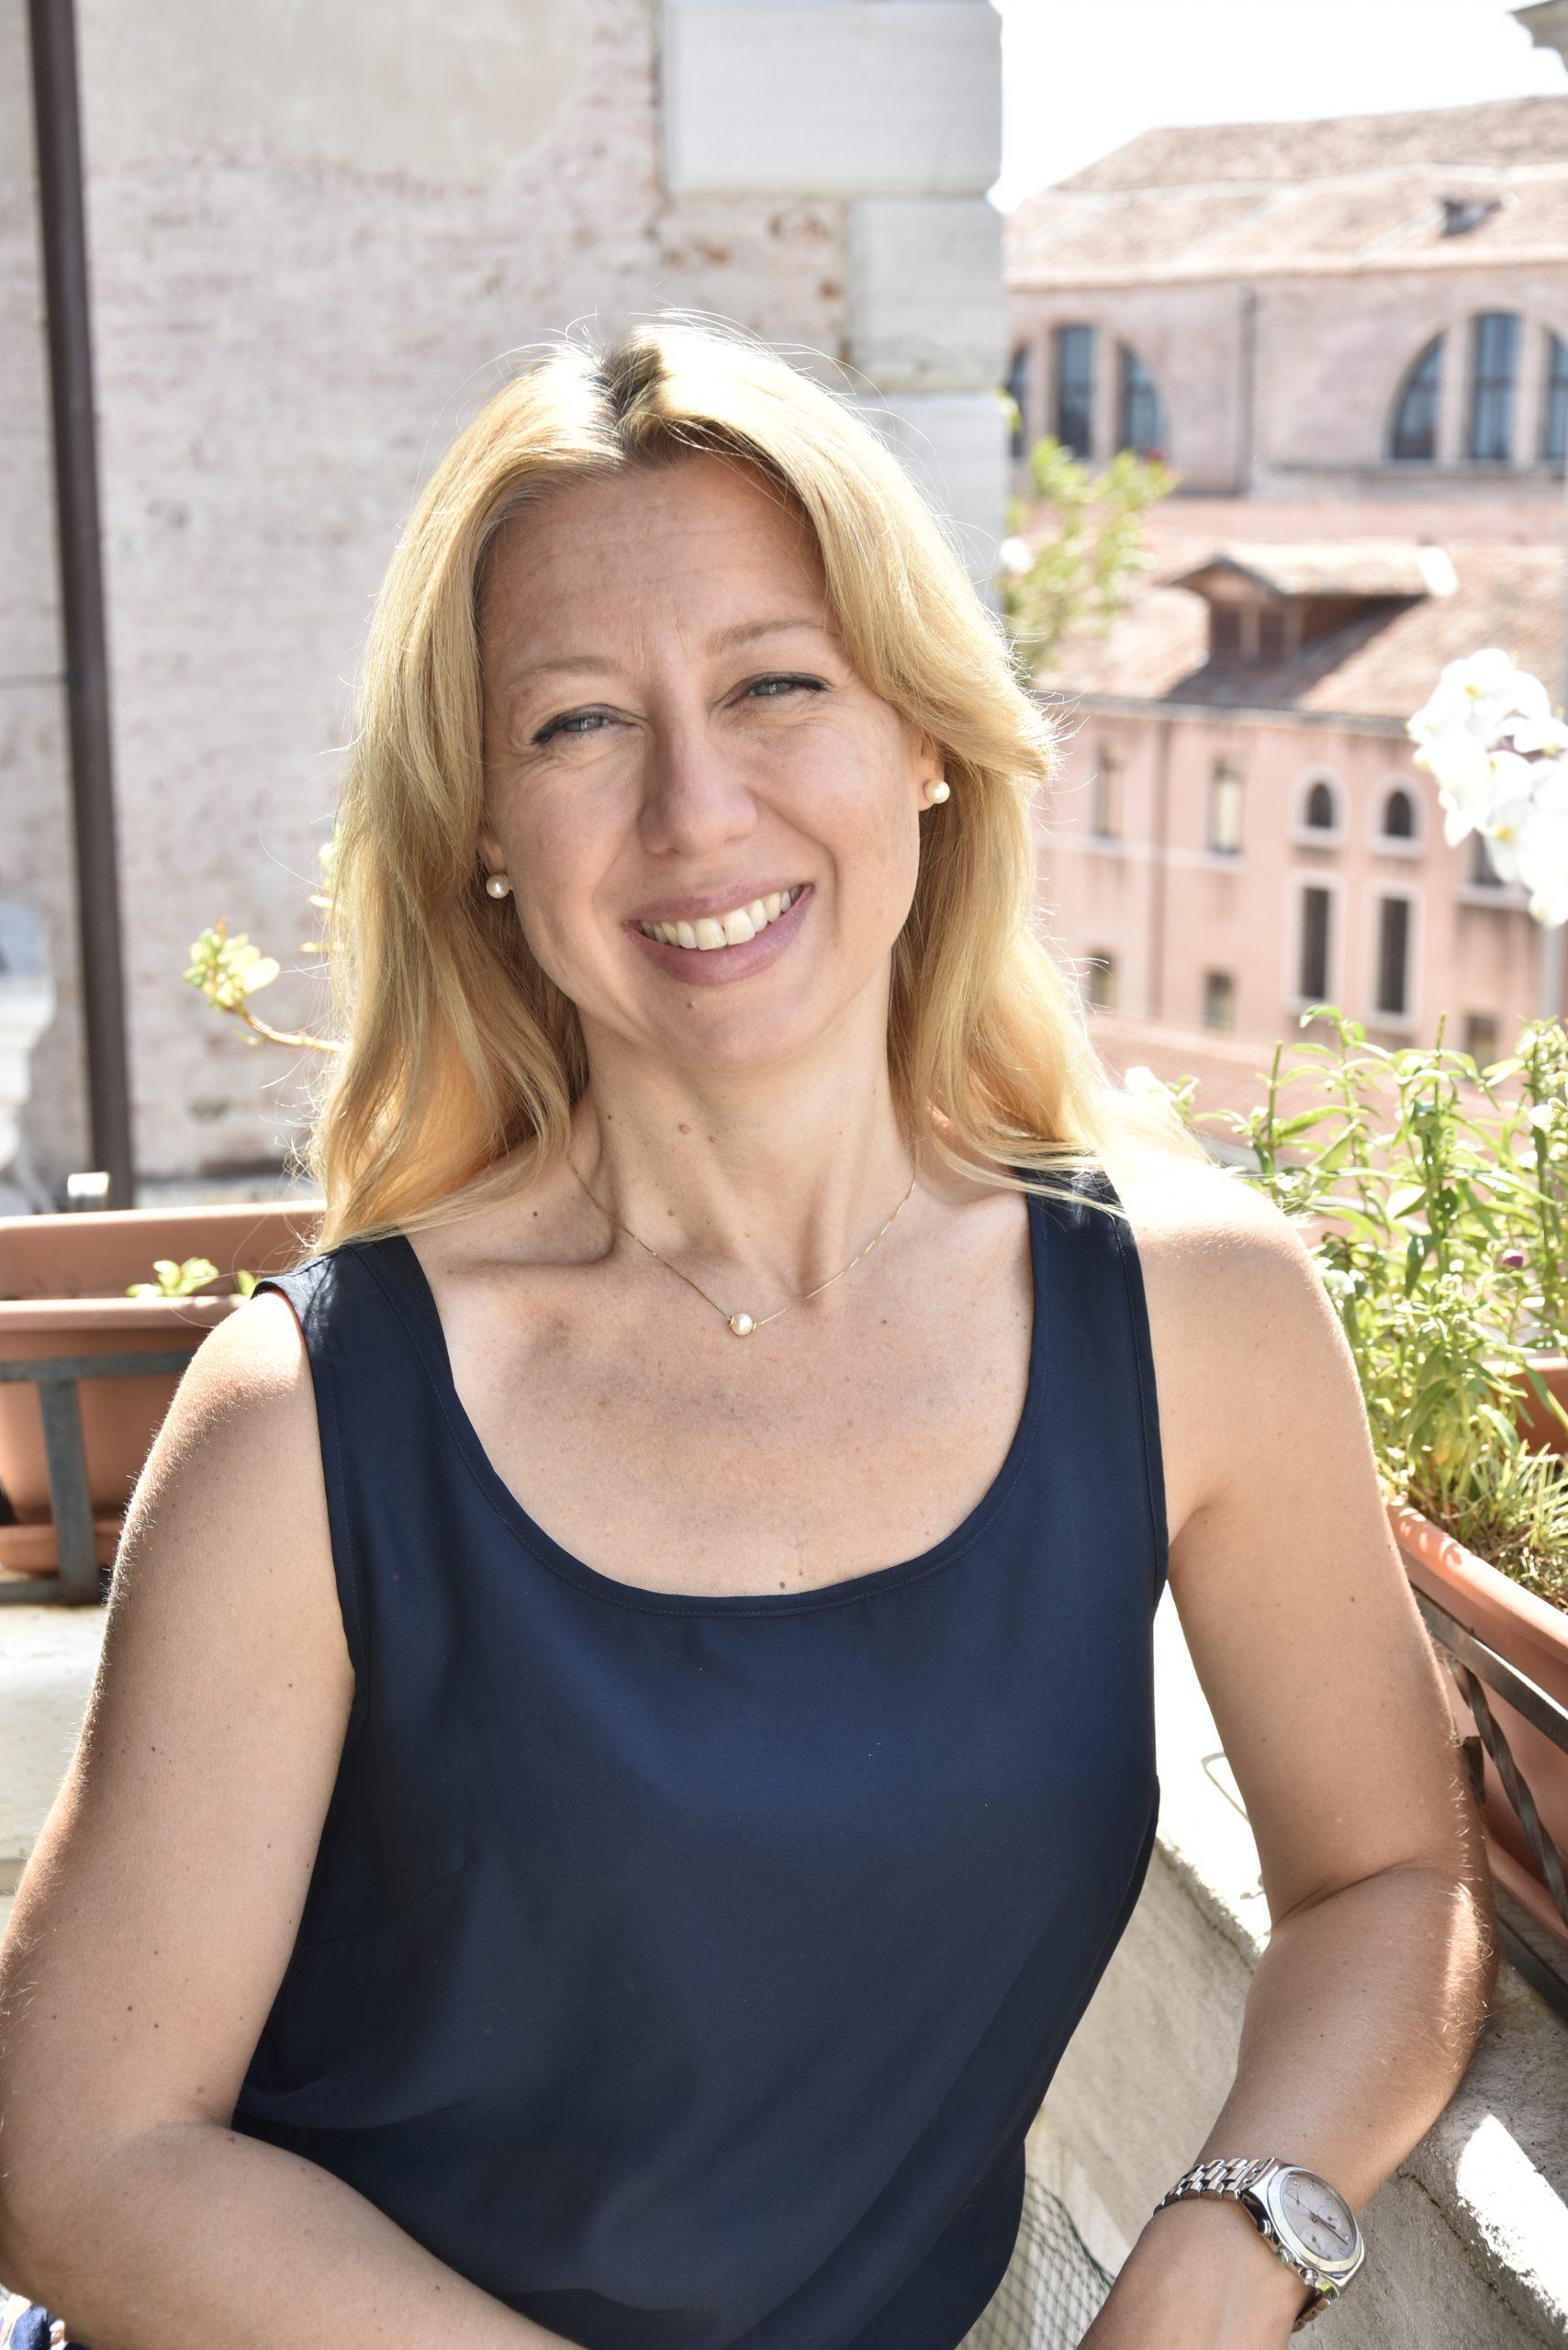 italian woman stands in her venetian balcony